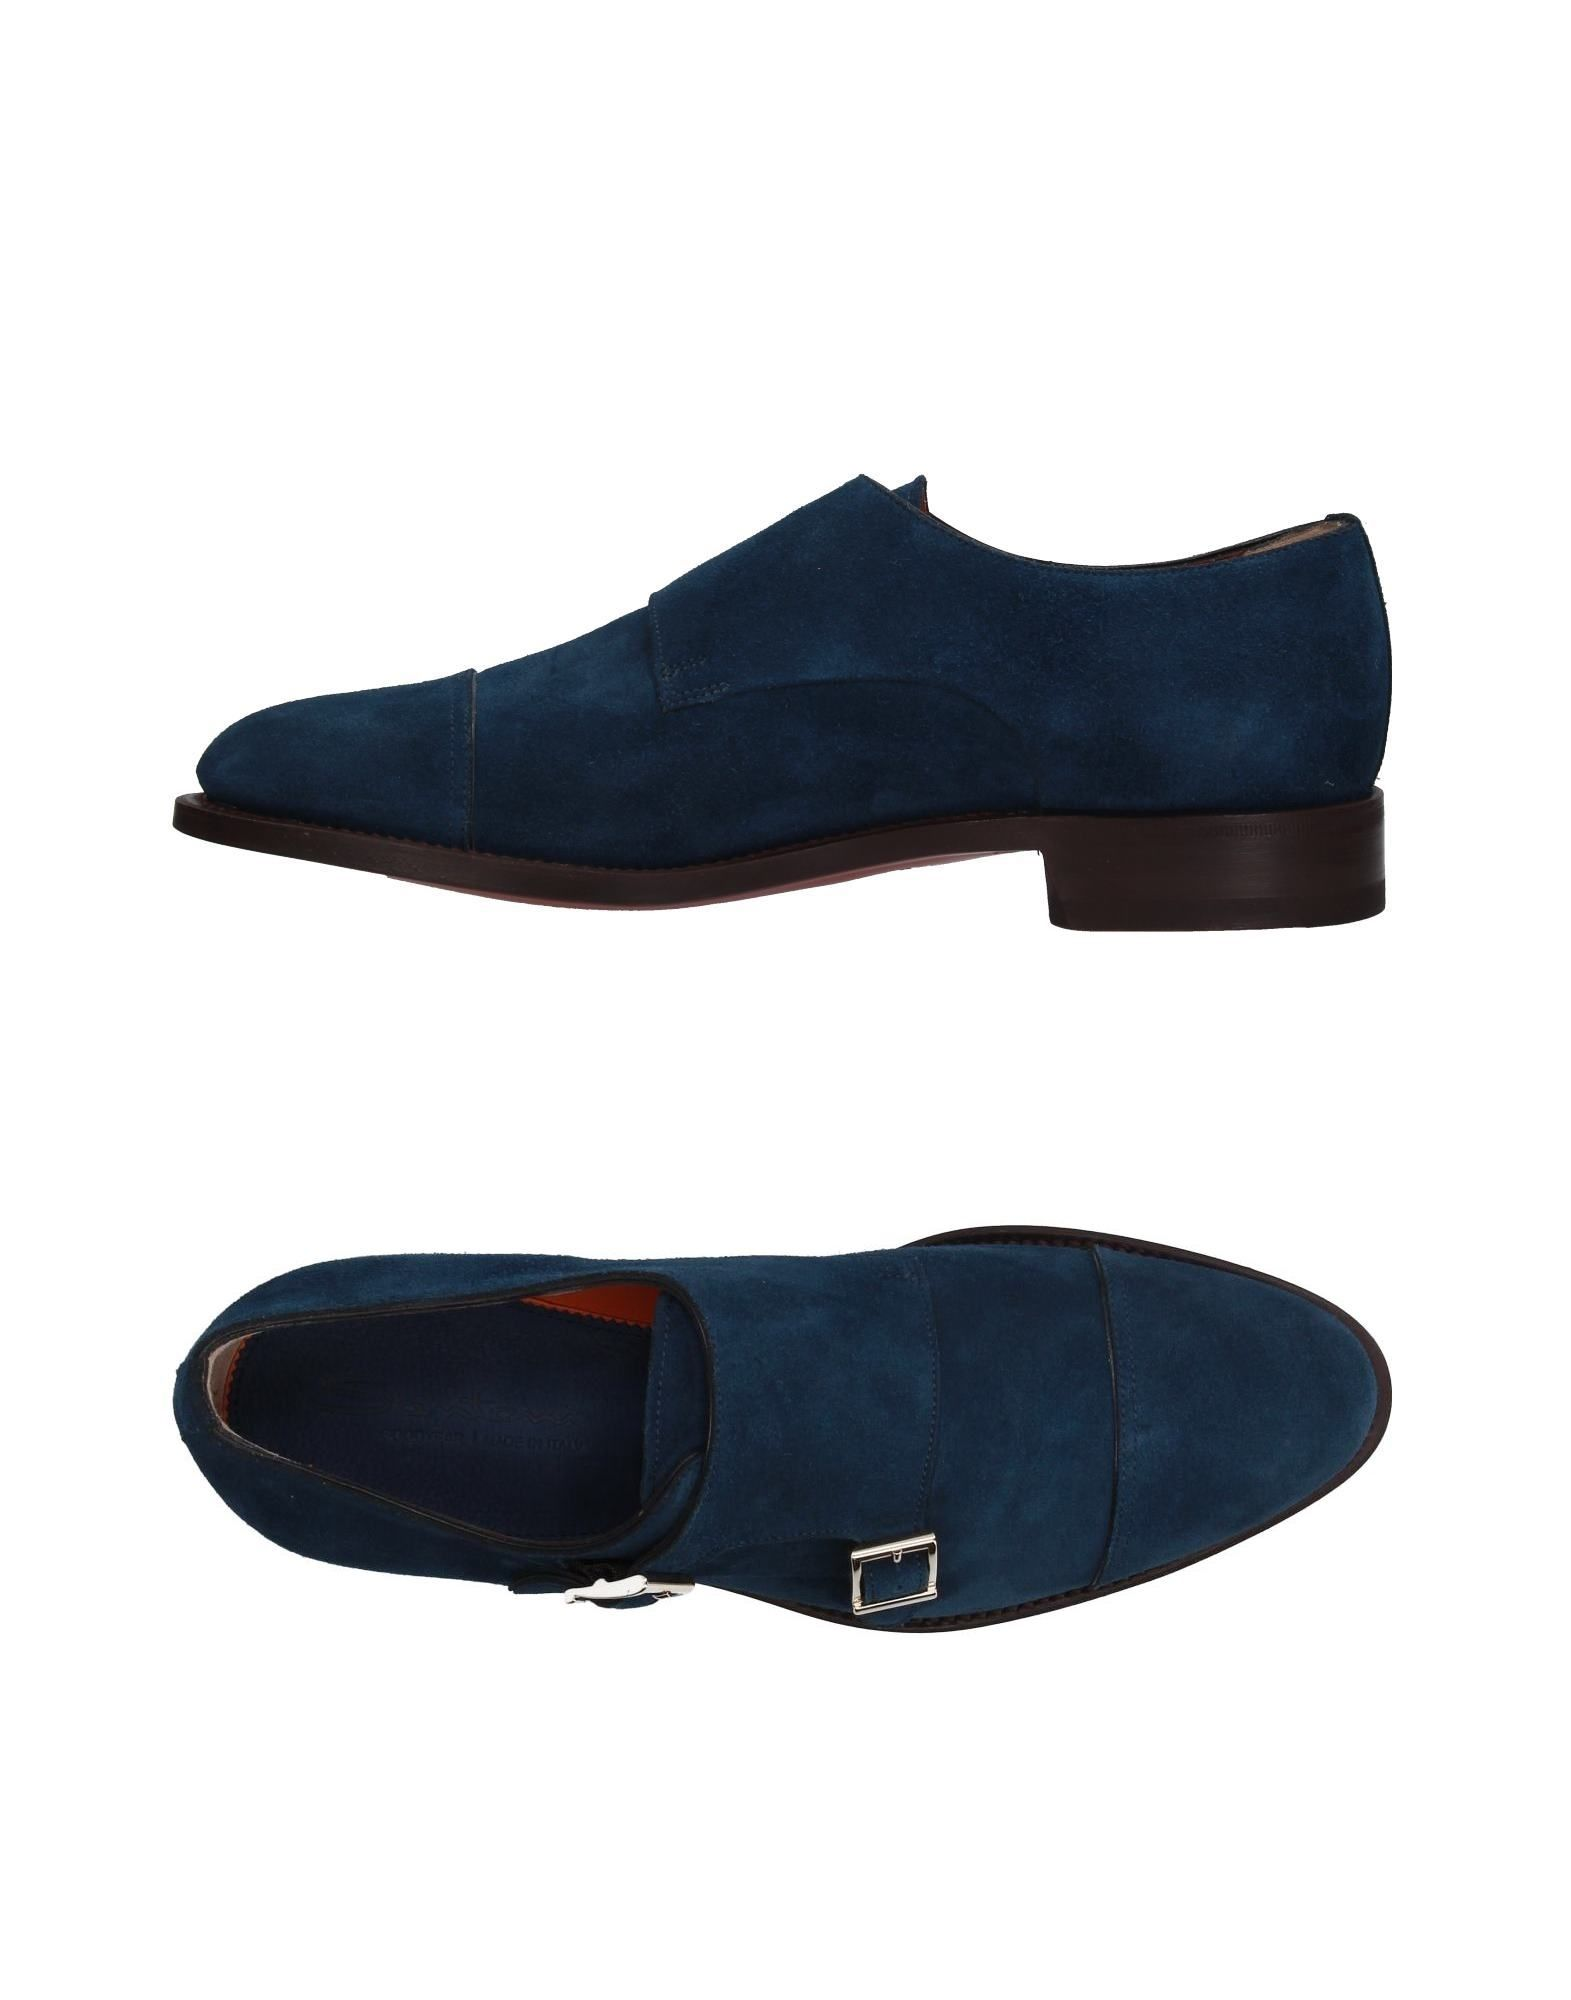 Santoni Mokassins Herren  11409608CQ Gute Qualität beliebte Schuhe